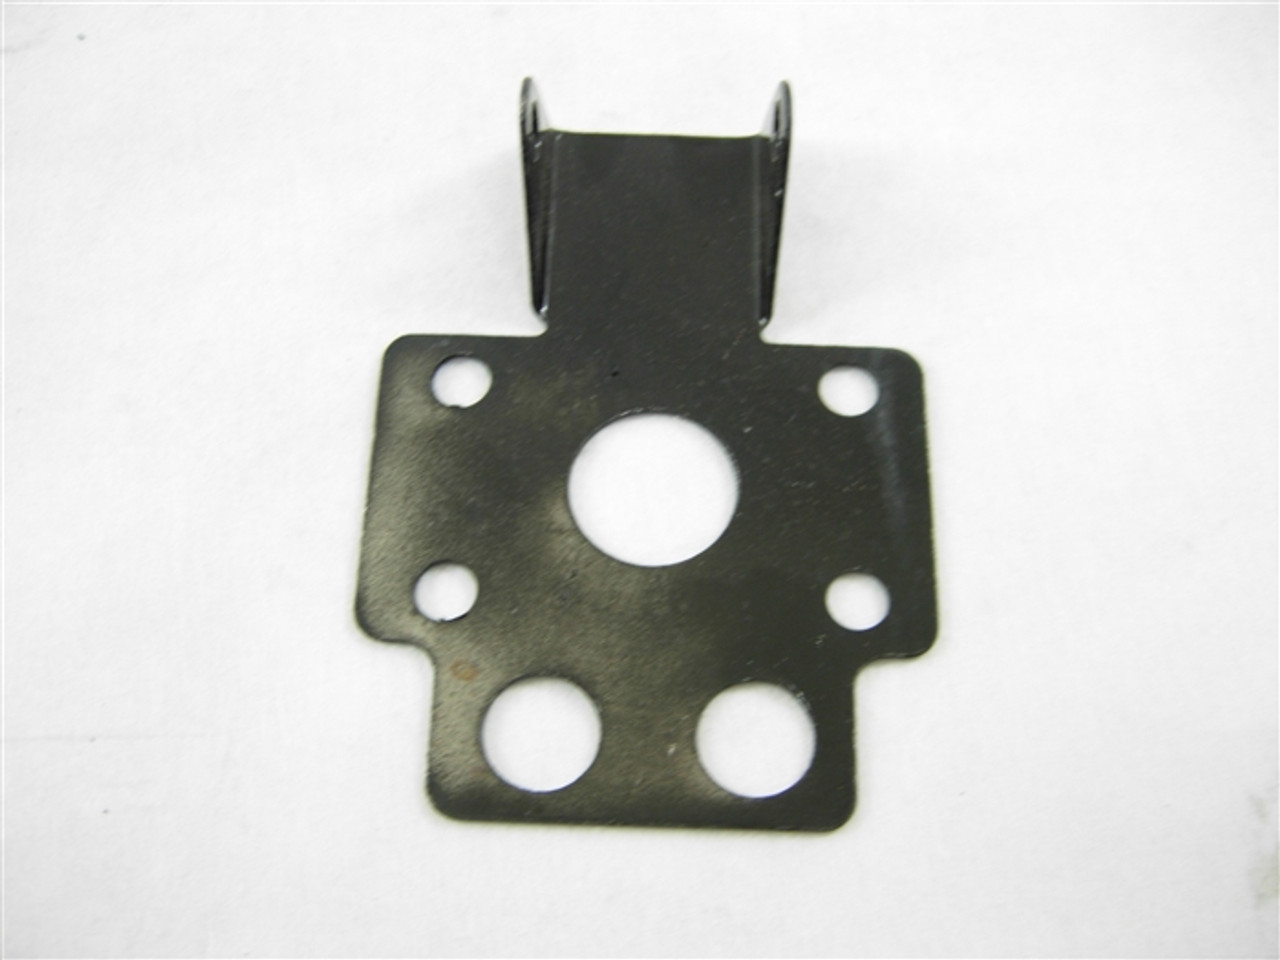 spot light bracket 13001-a167-13